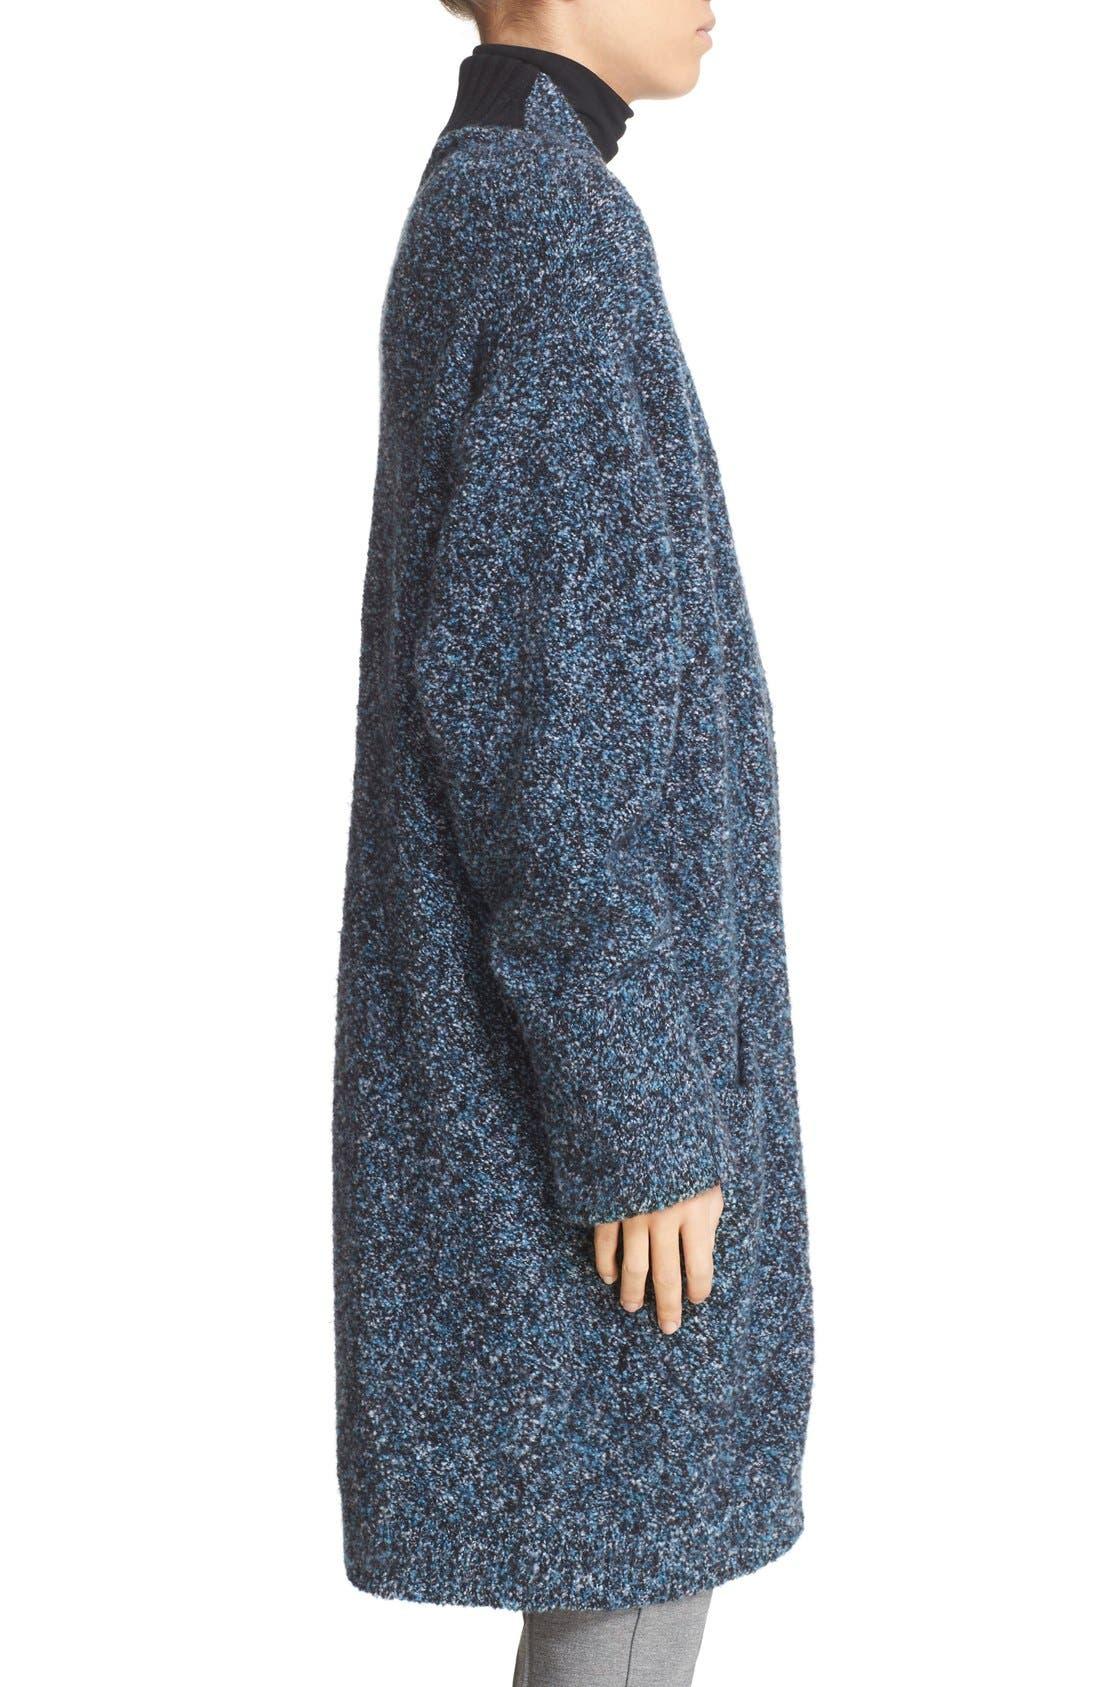 'Diana' Sweater Coat,                             Alternate thumbnail 2, color,                             474